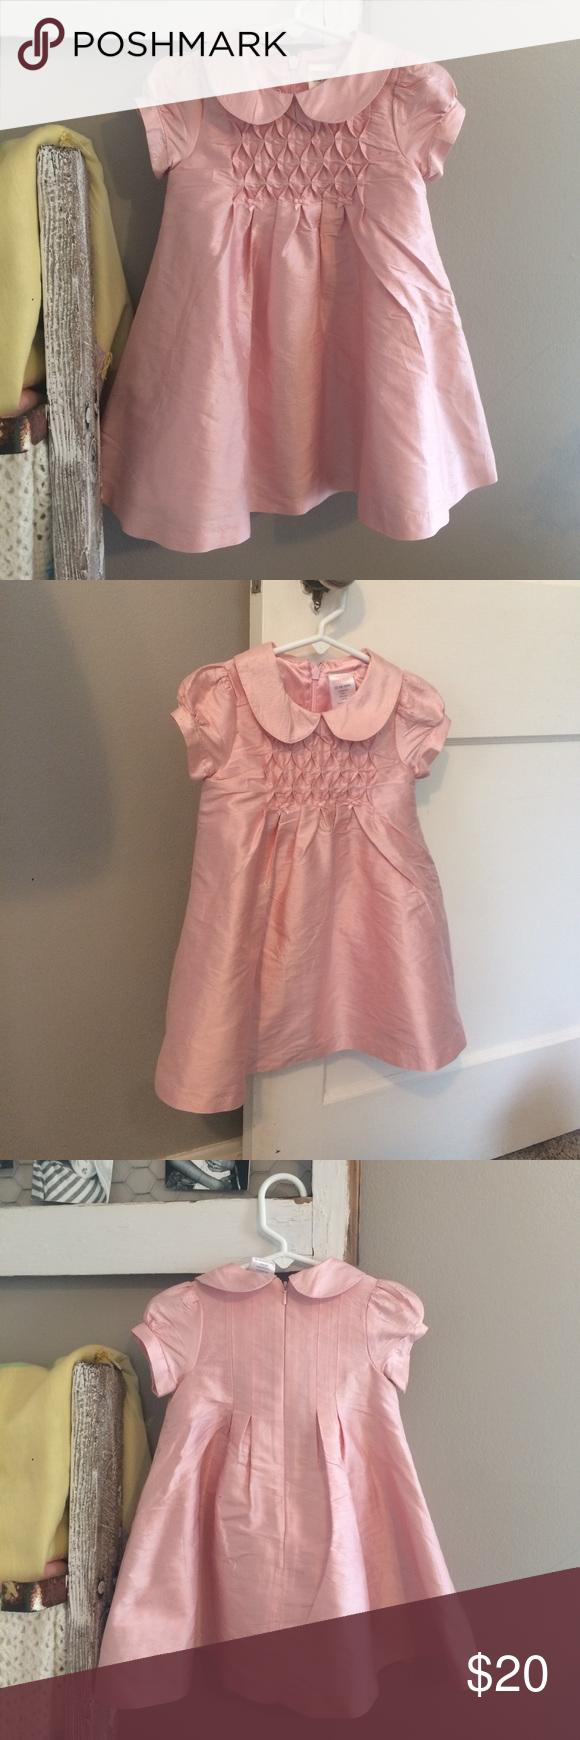 Pink dress baby  NWT Gymboree Baby Girl ALine Silk Taffeta Dress NWT Adorable light